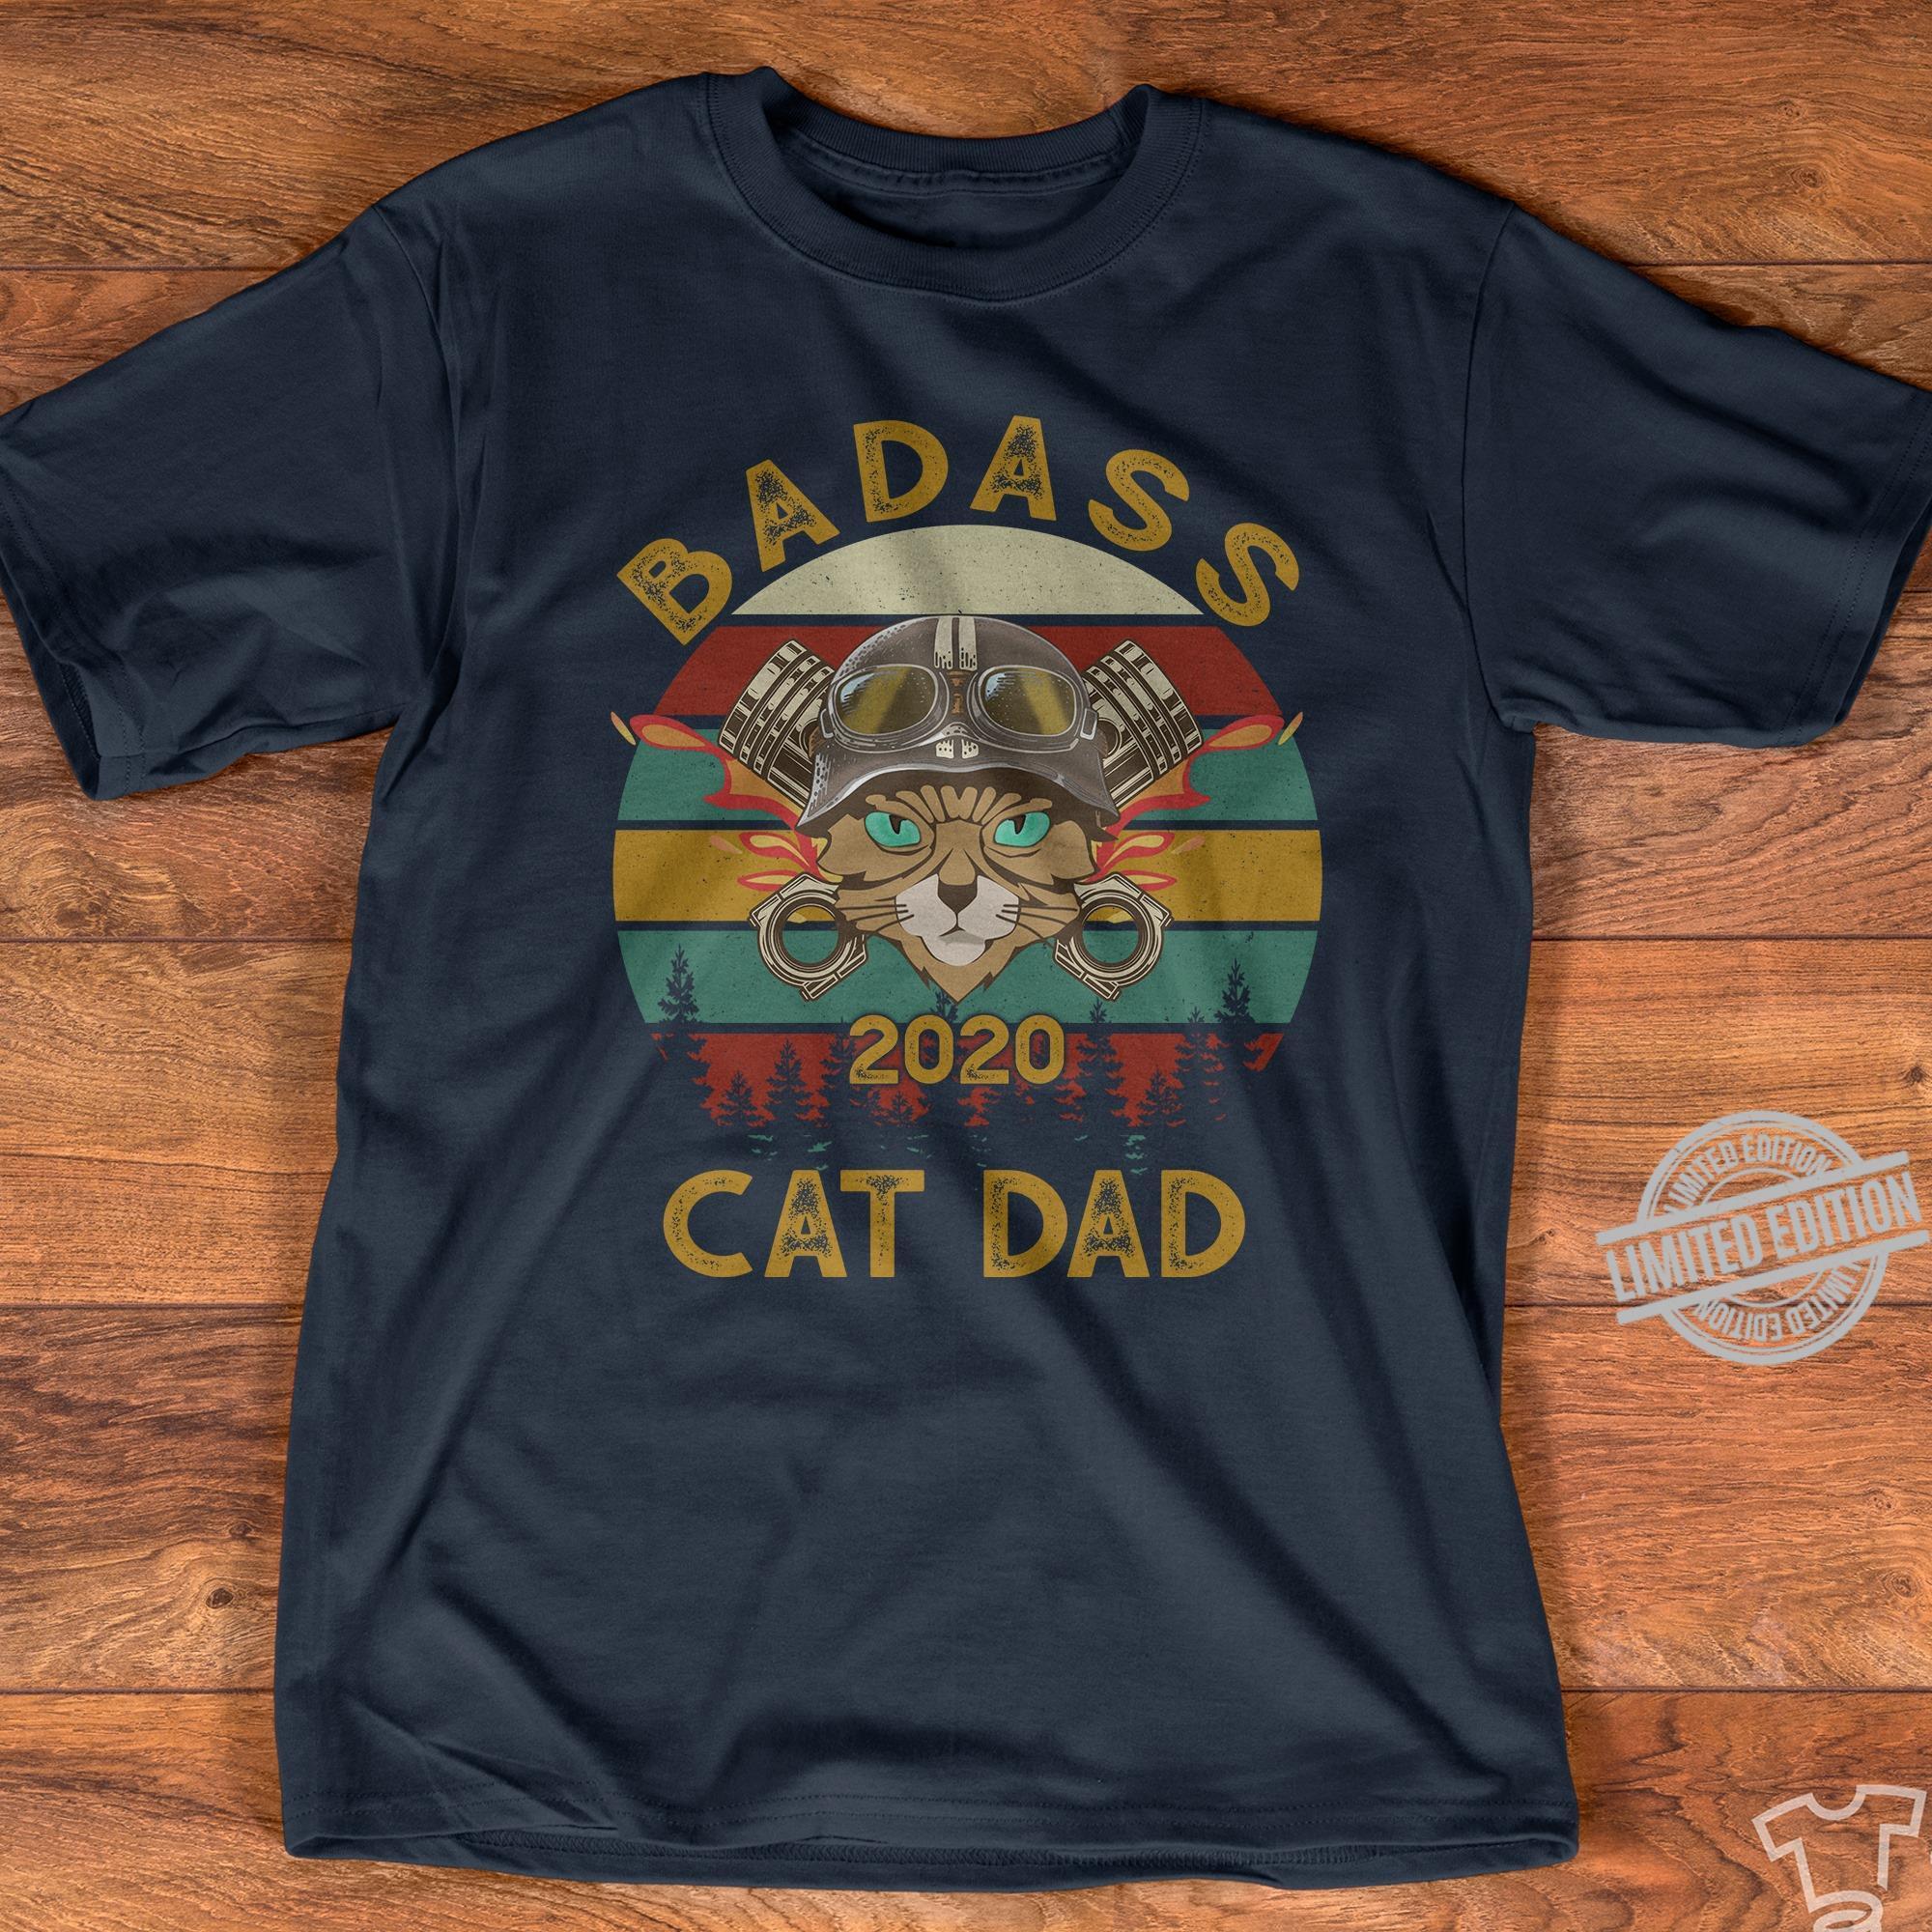 Badass 2020 Cat Dad Shirt